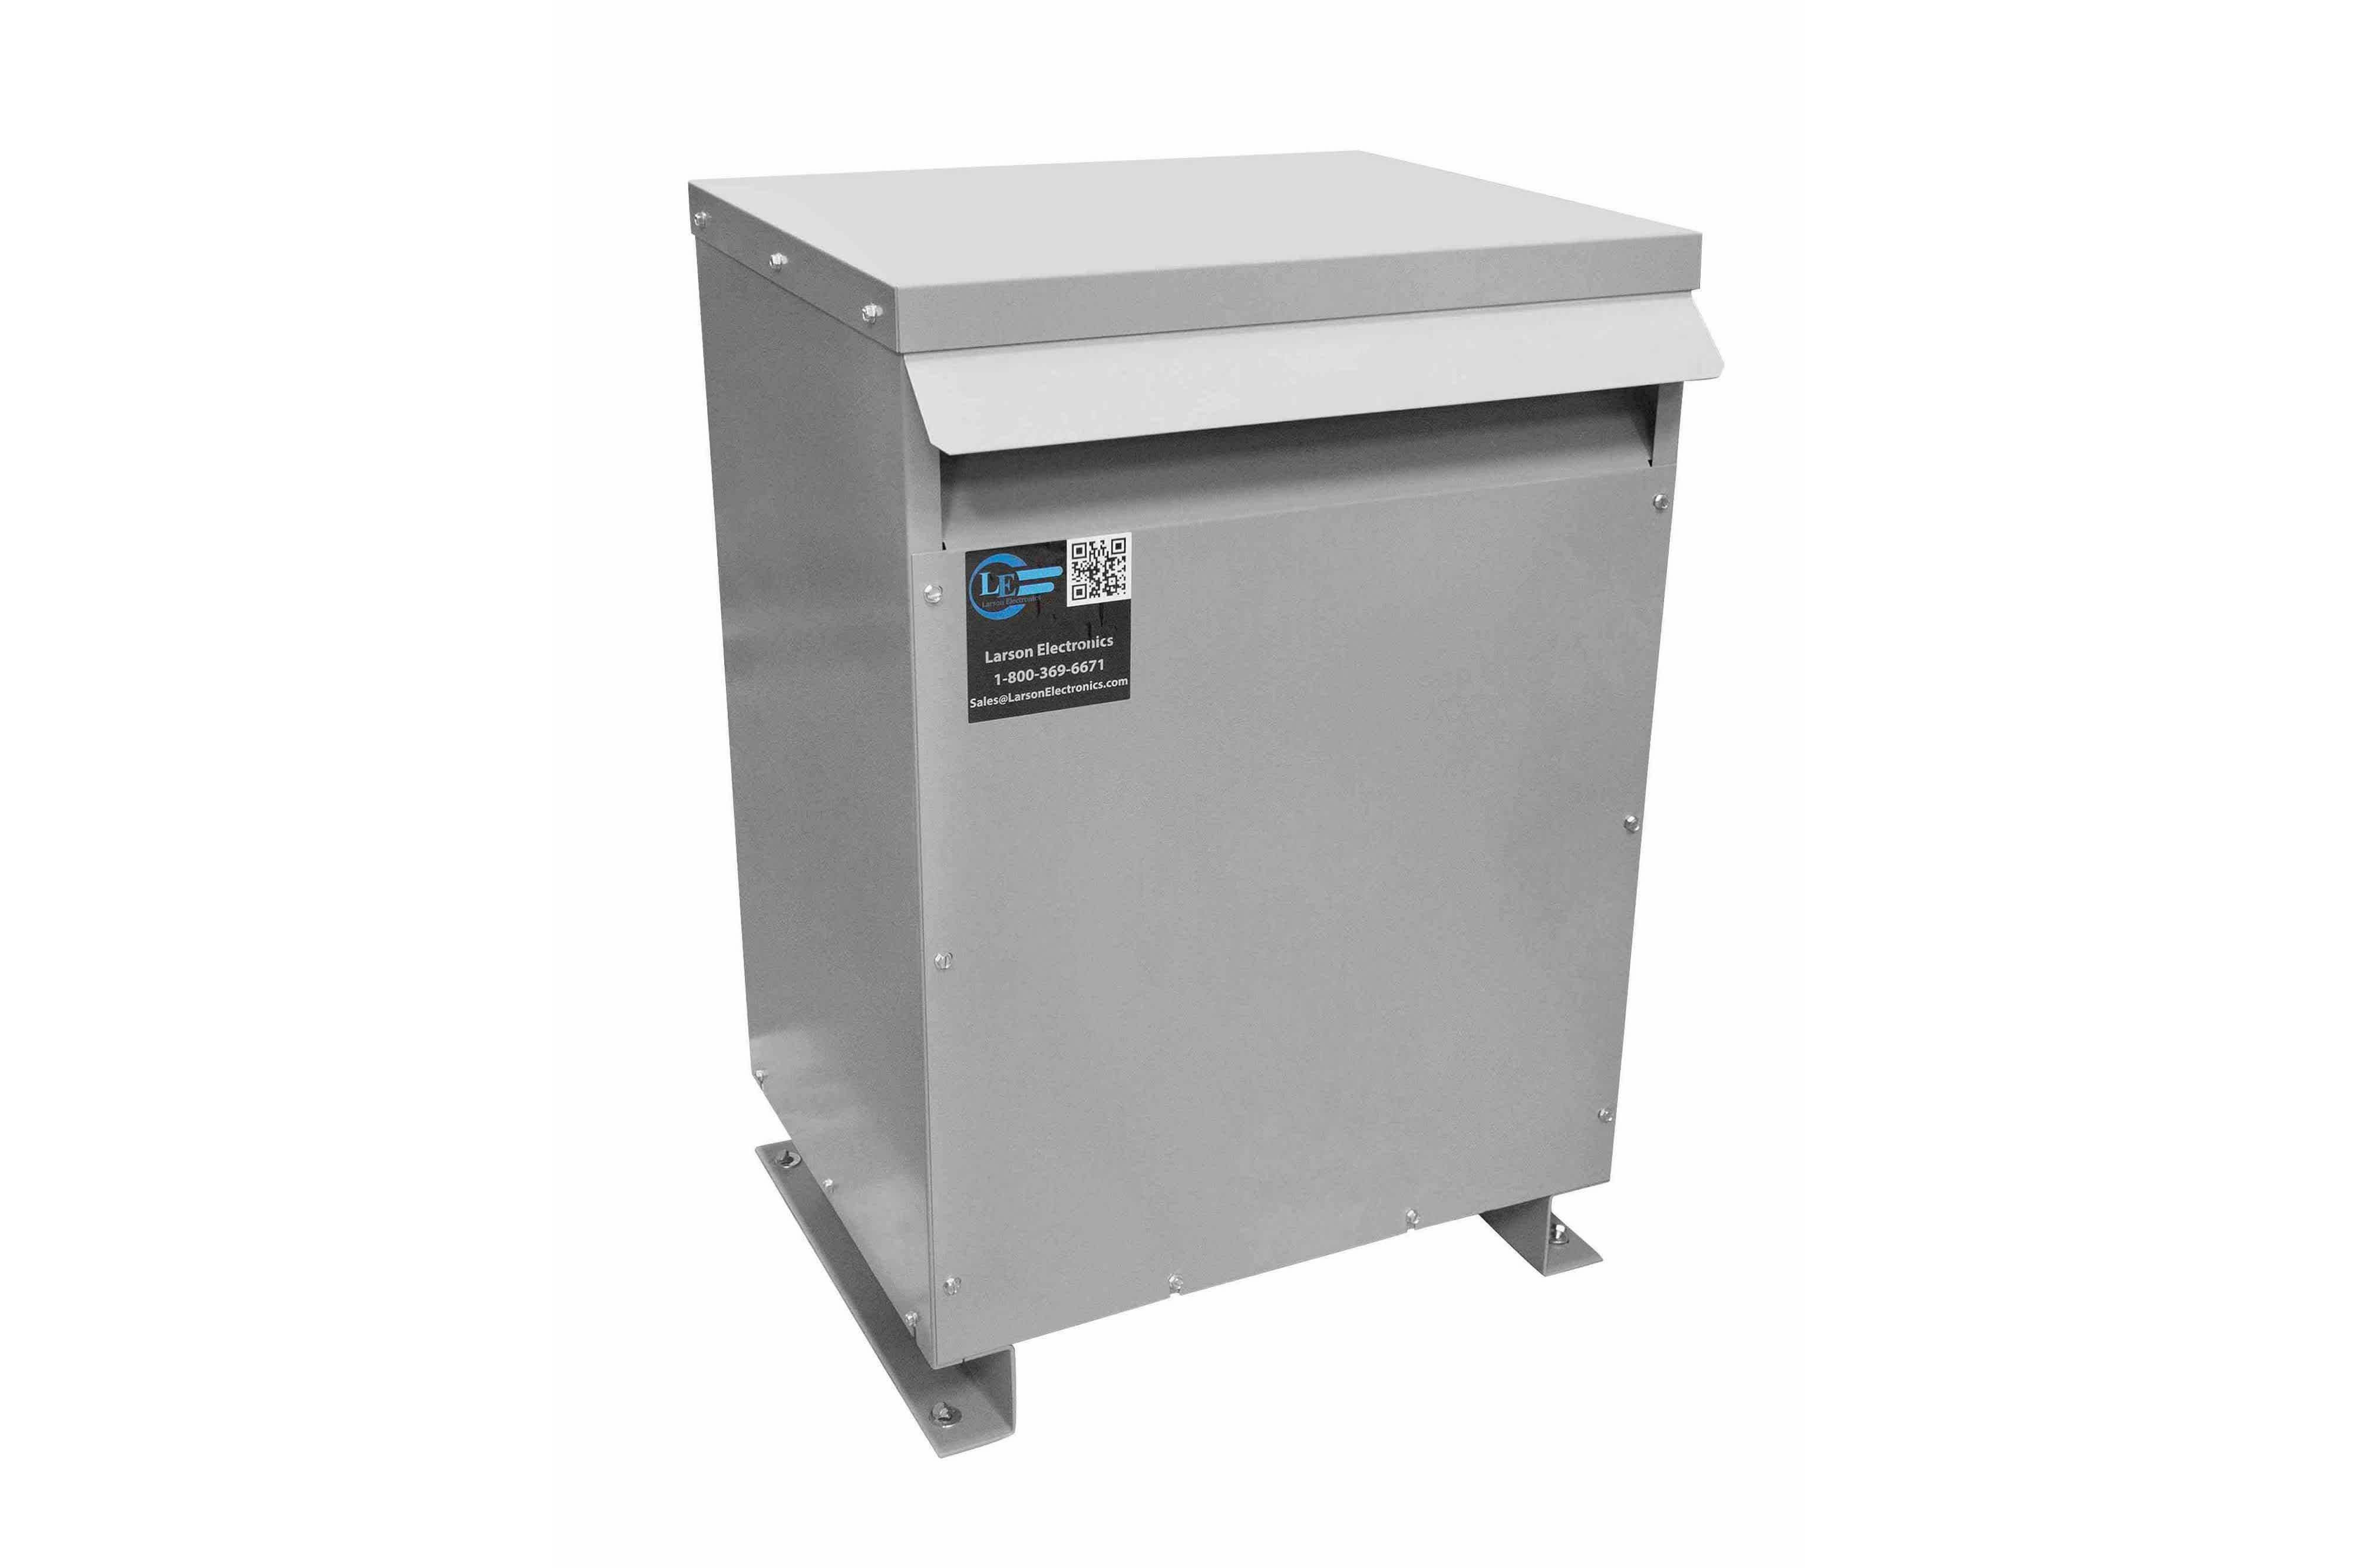 45 kVA 3PH Isolation Transformer, 240V Wye Primary, 400V Delta Secondary, N3R, Ventilated, 60 Hz